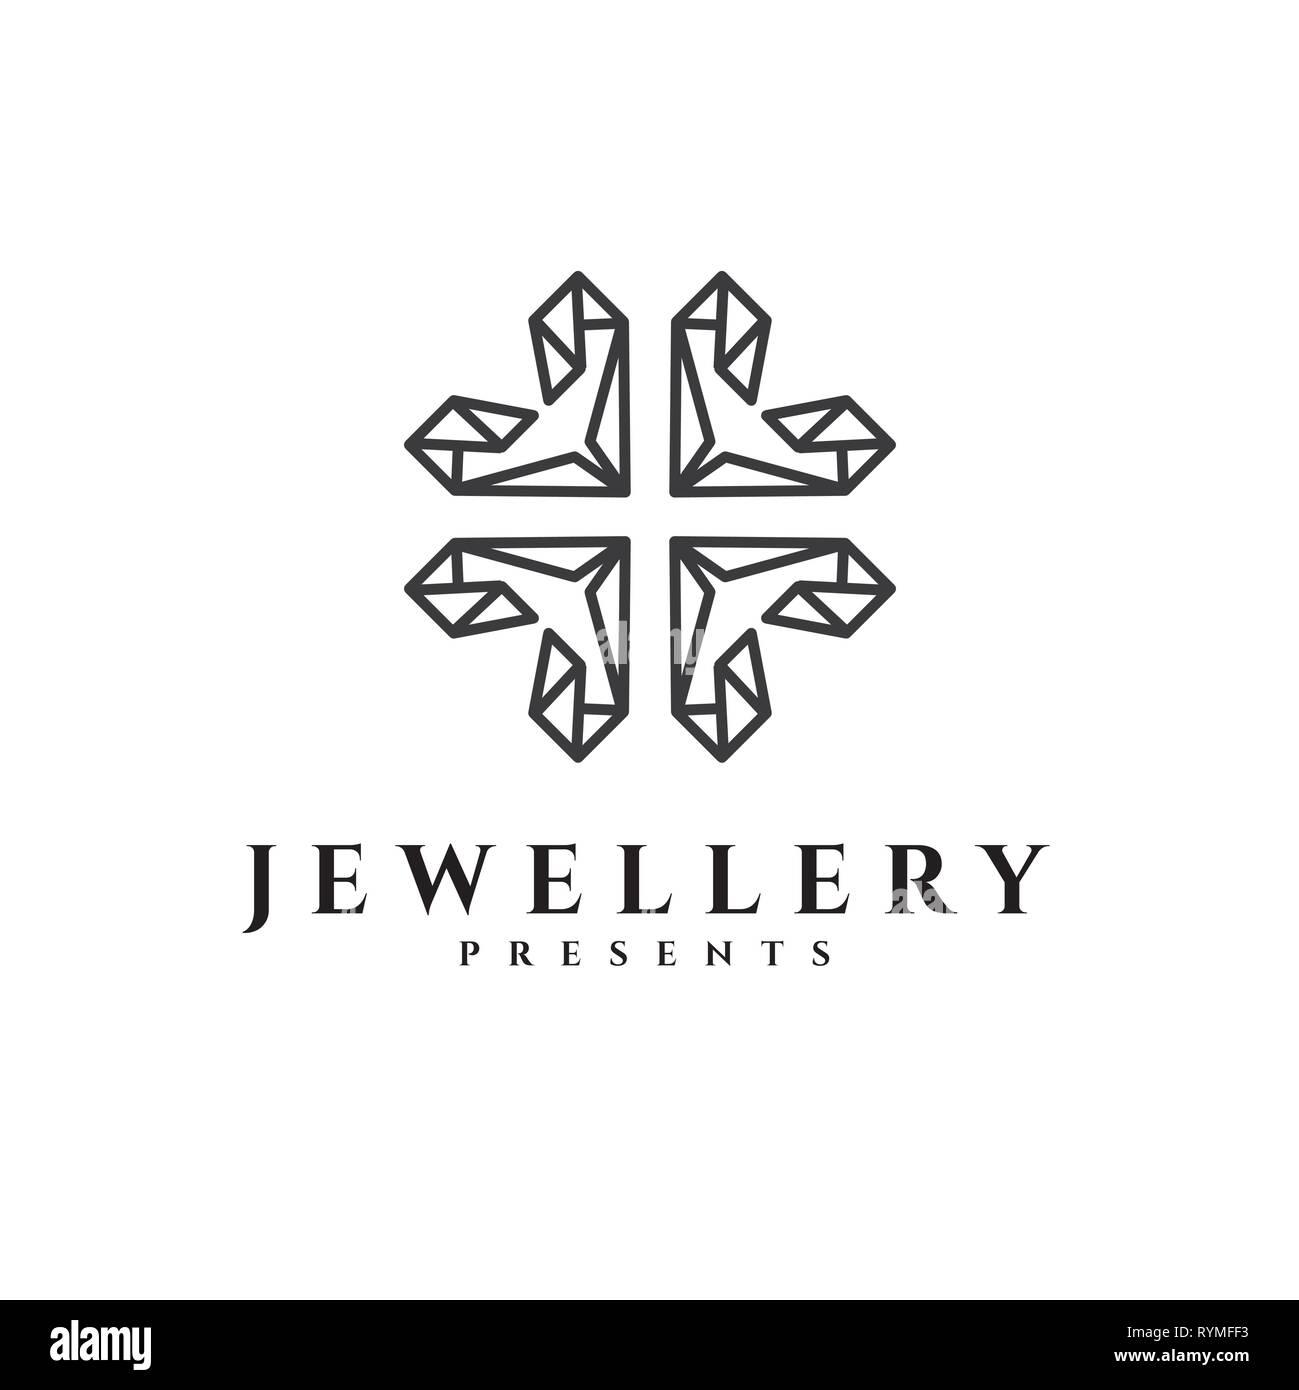 Jewellery vector logo - Stock Image